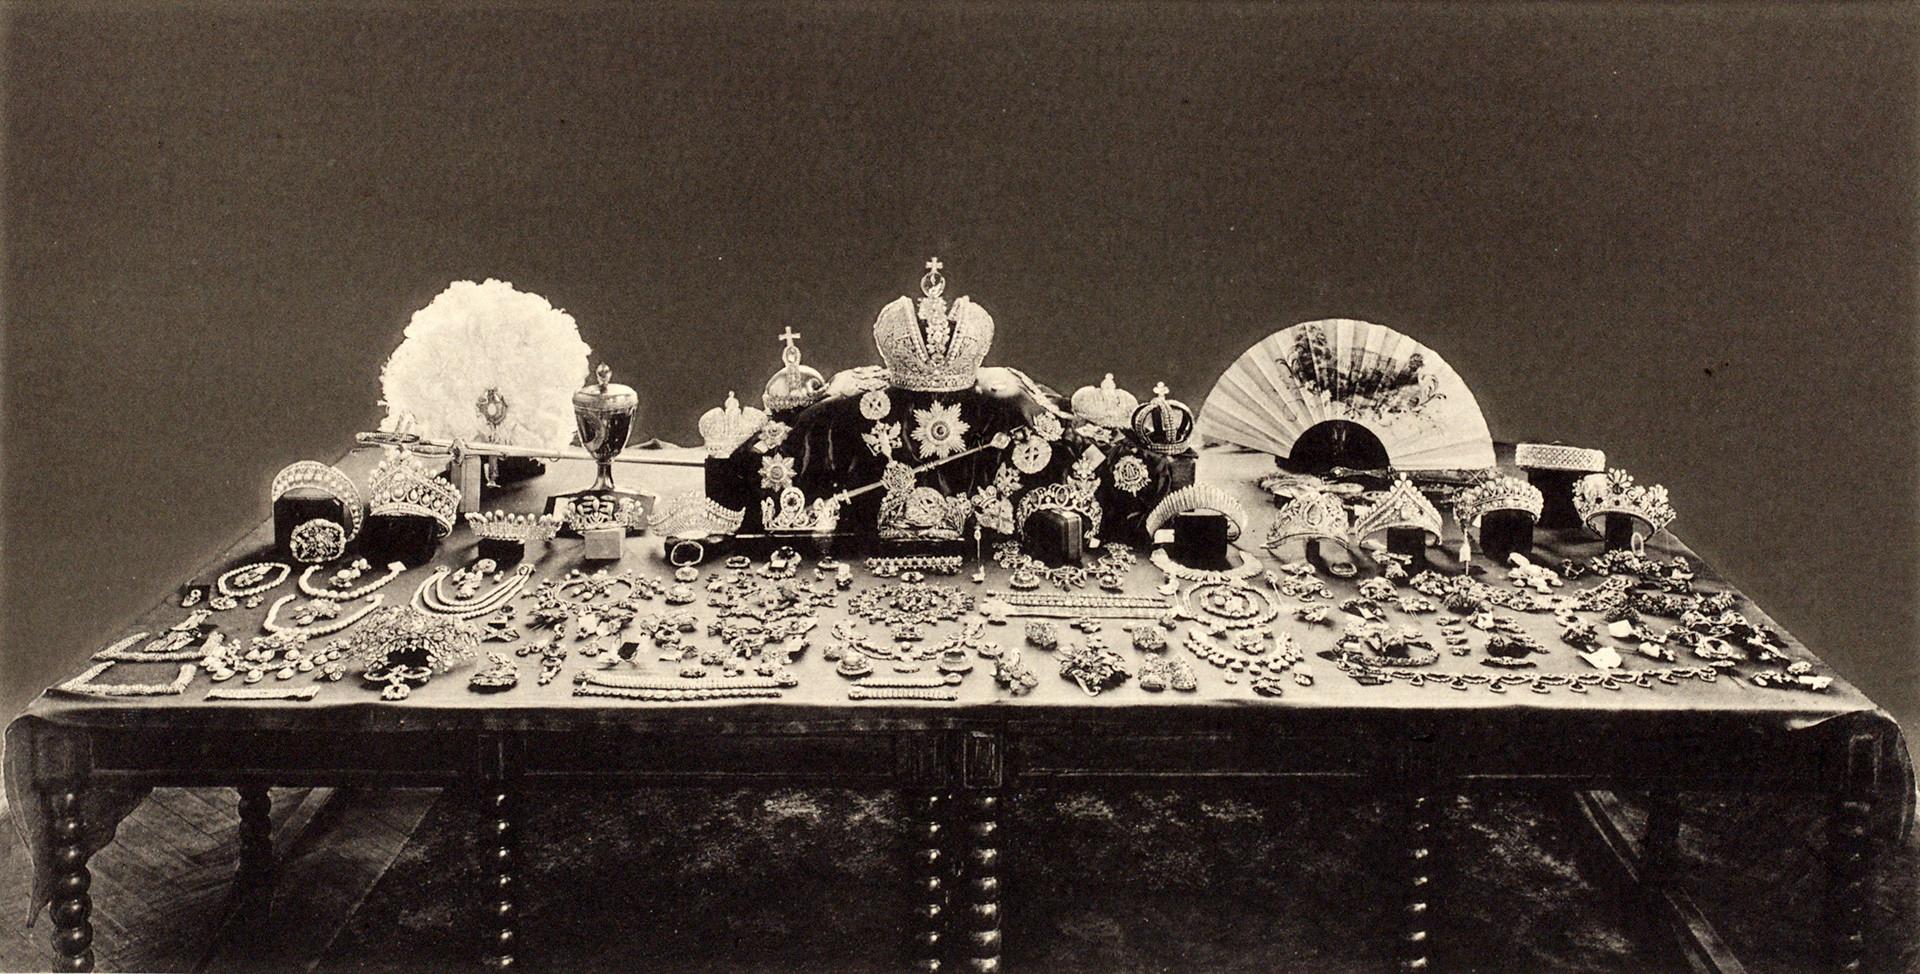 Diambil pada 1925, foto ini menunjukkan seluruh koleksi perhiasan Rusia.